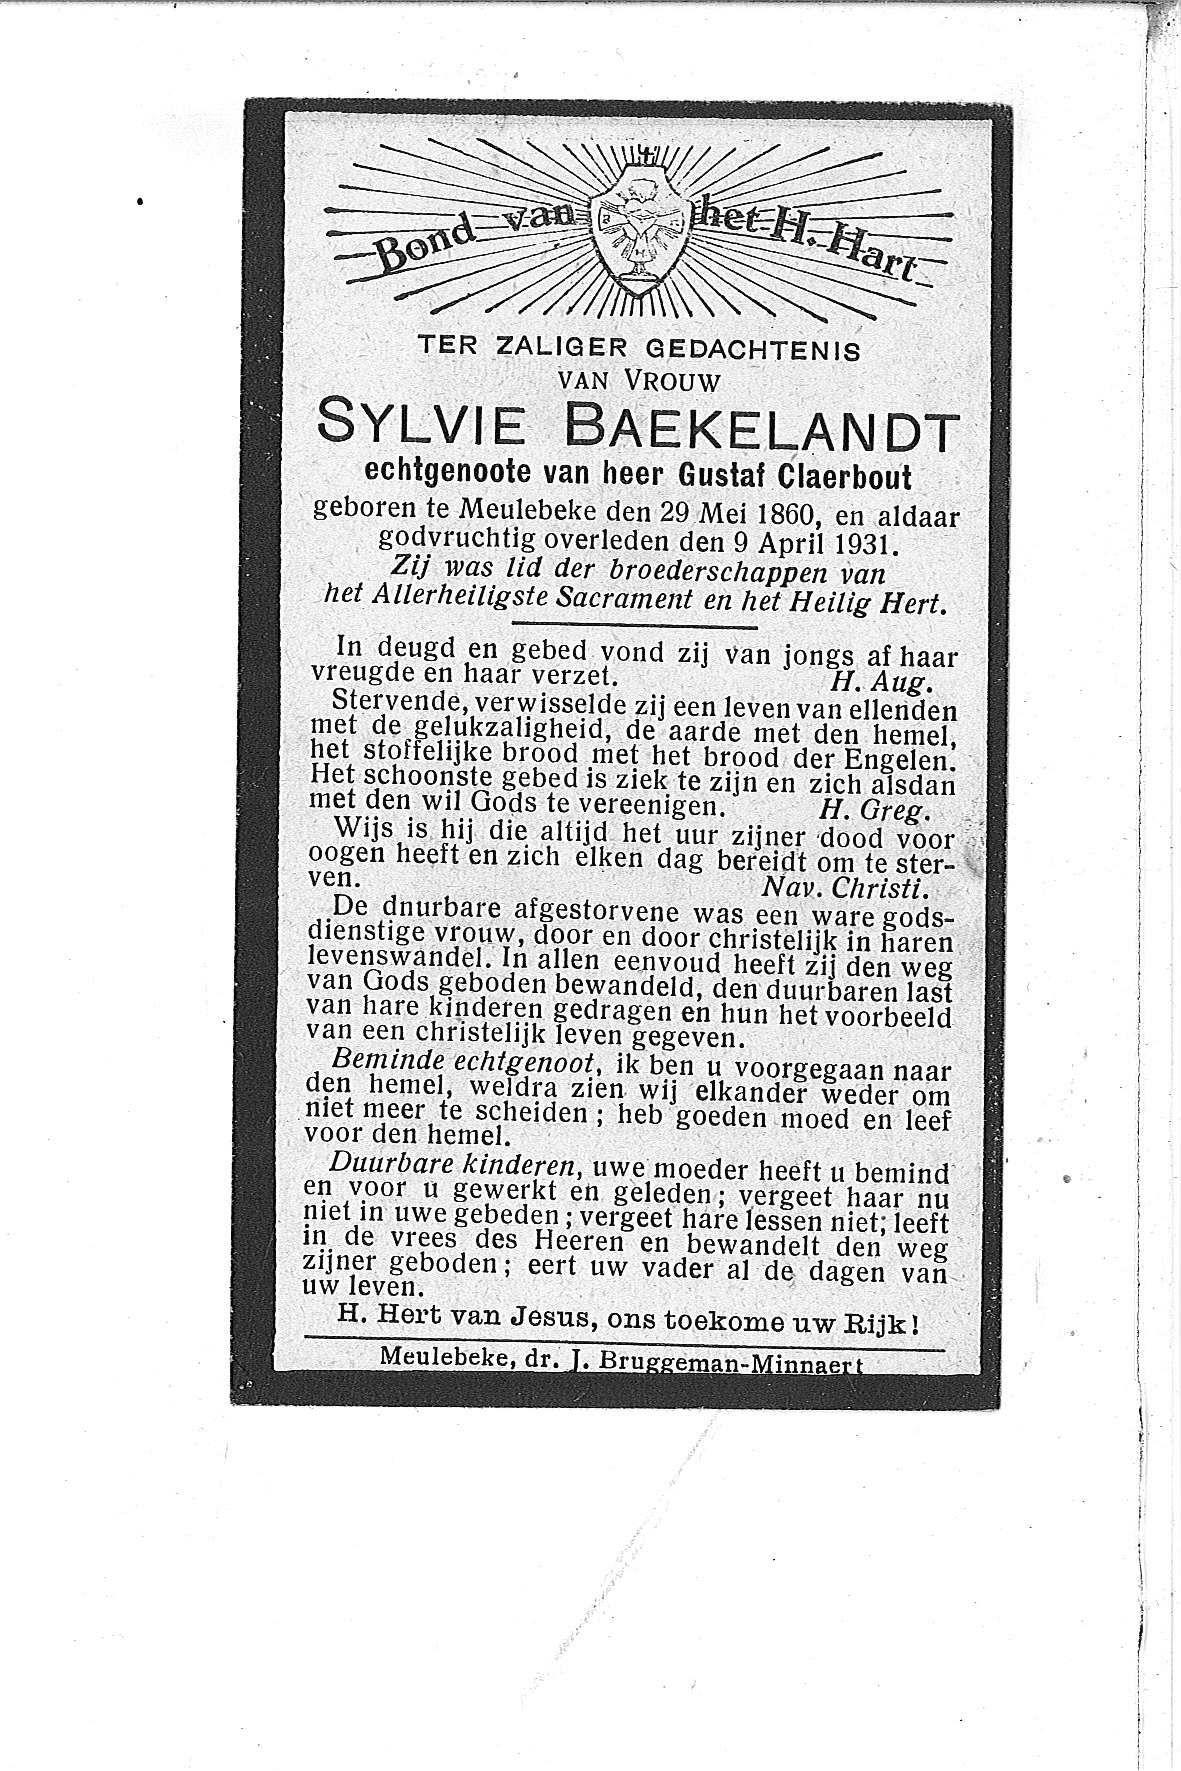 Sylvie(1931)20100928100226_00023.jpg